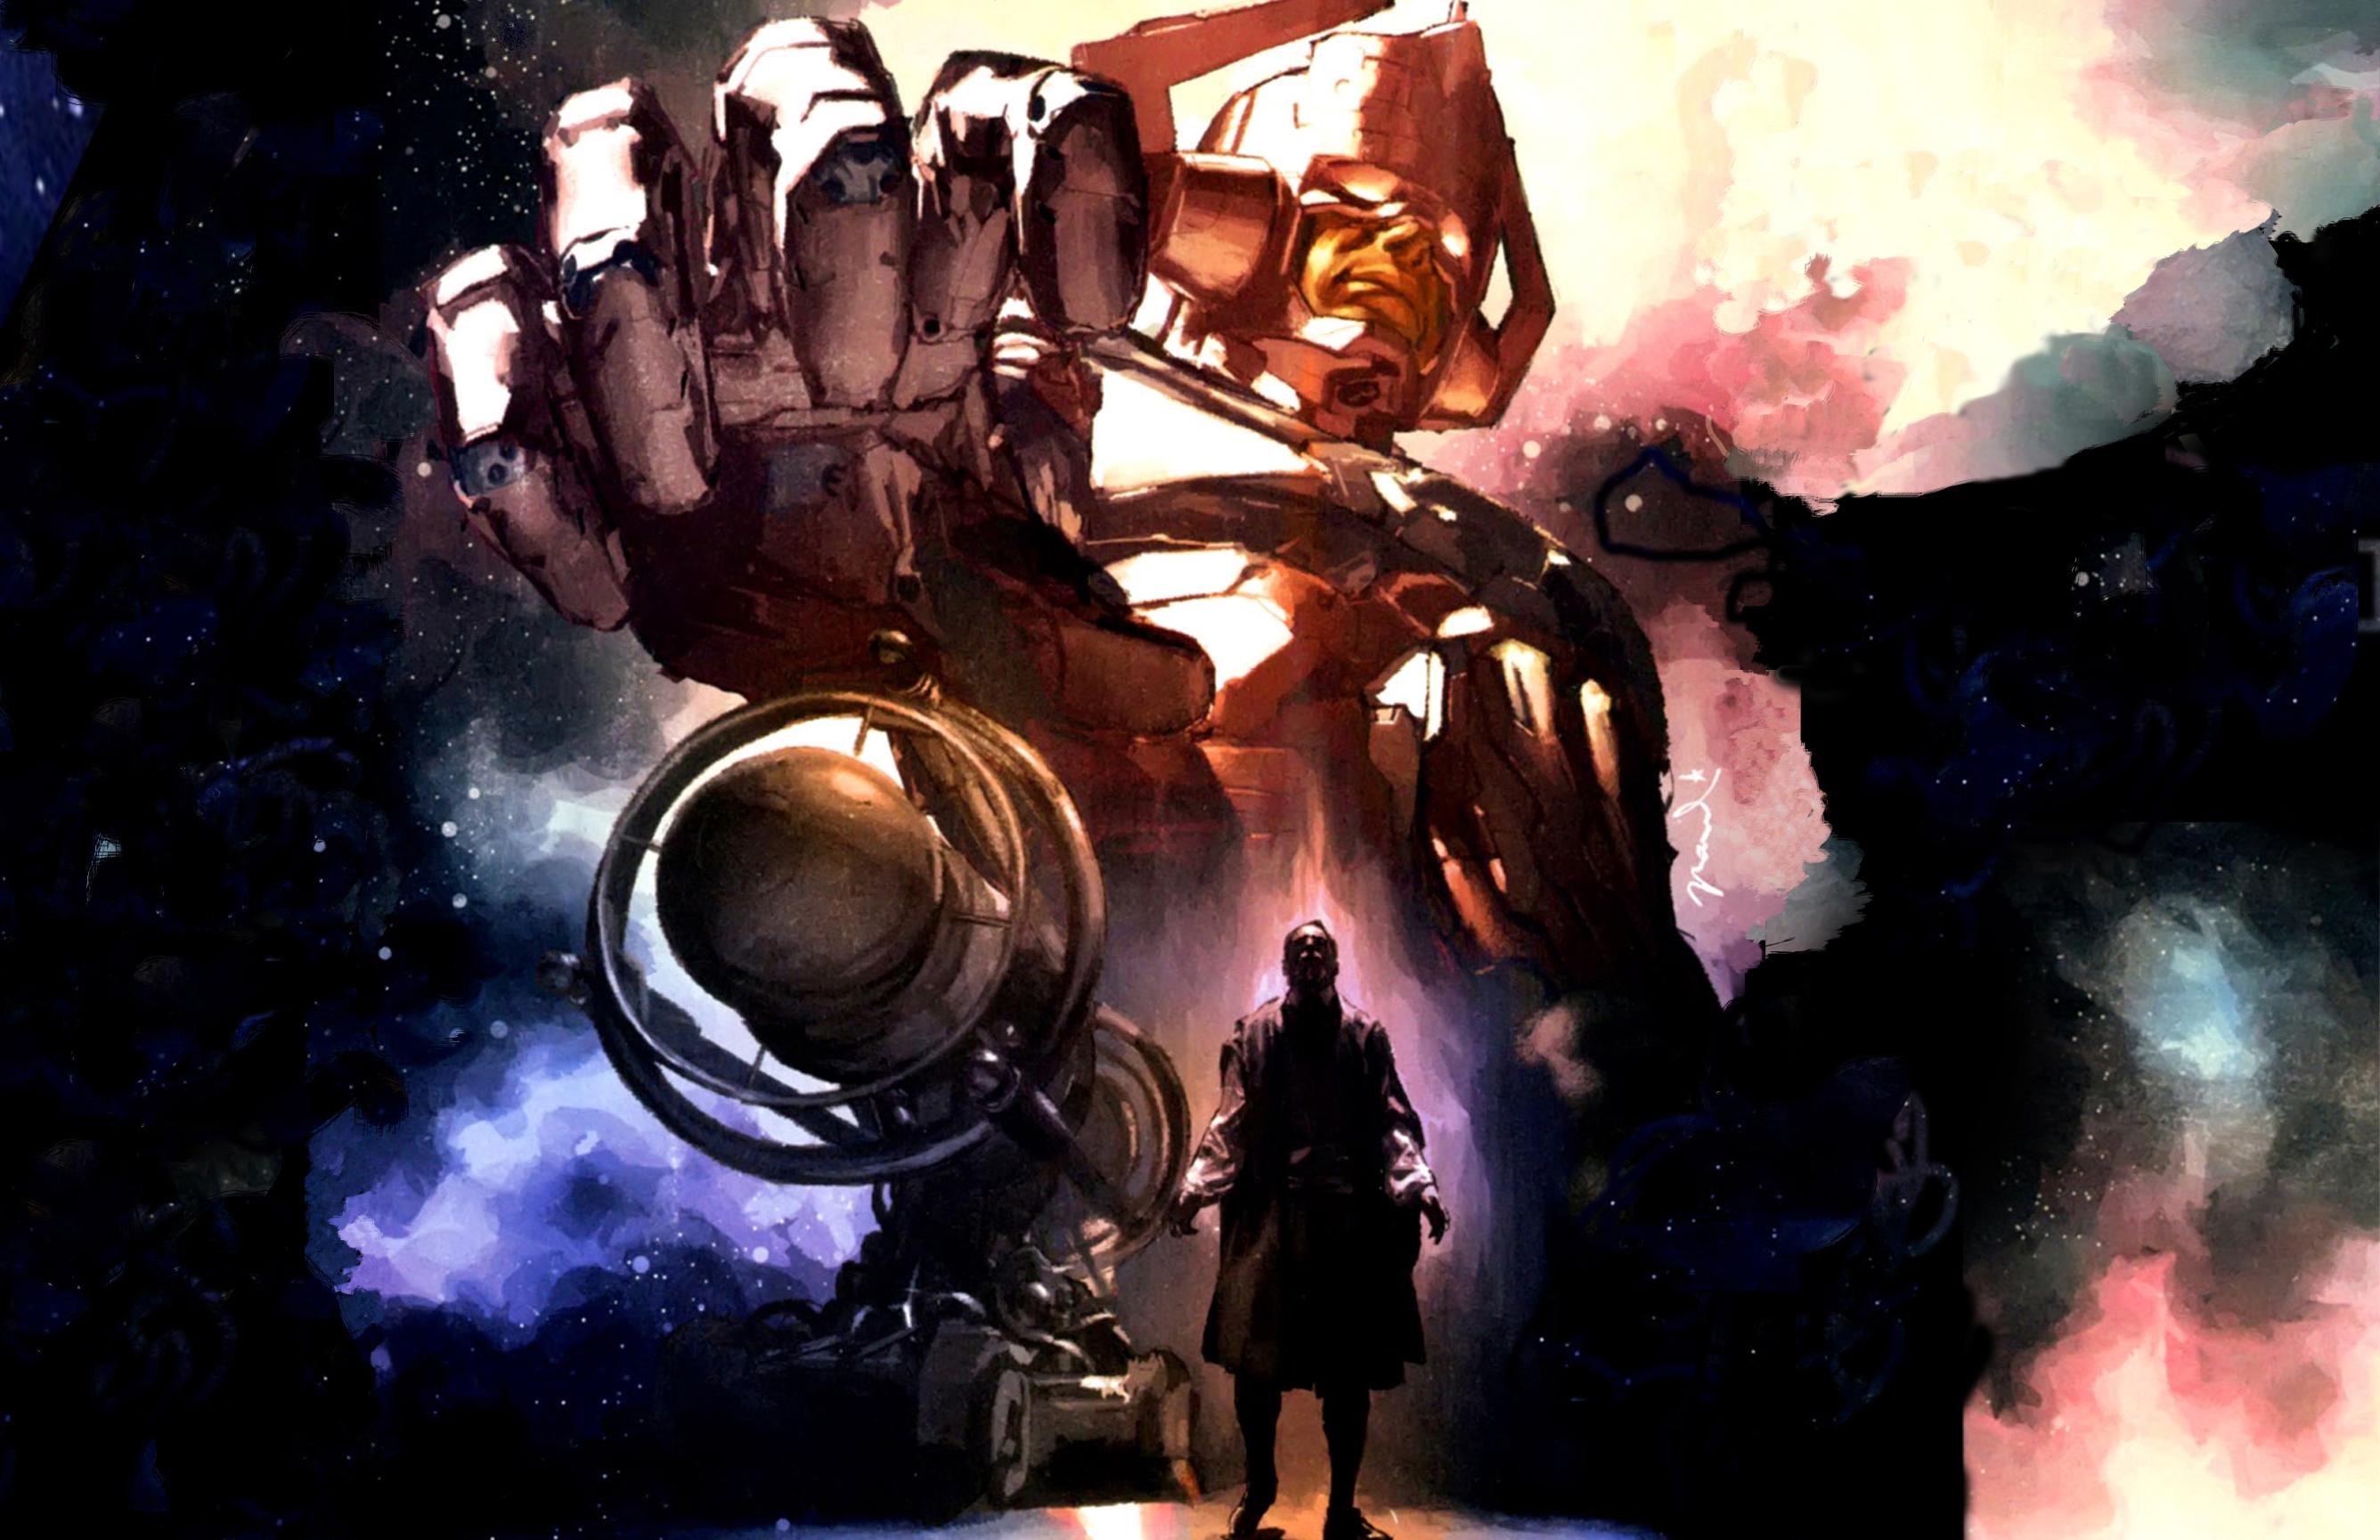 marvel comics galactus HD Wallpaper   Cartoon Animation 859877 2672x1729